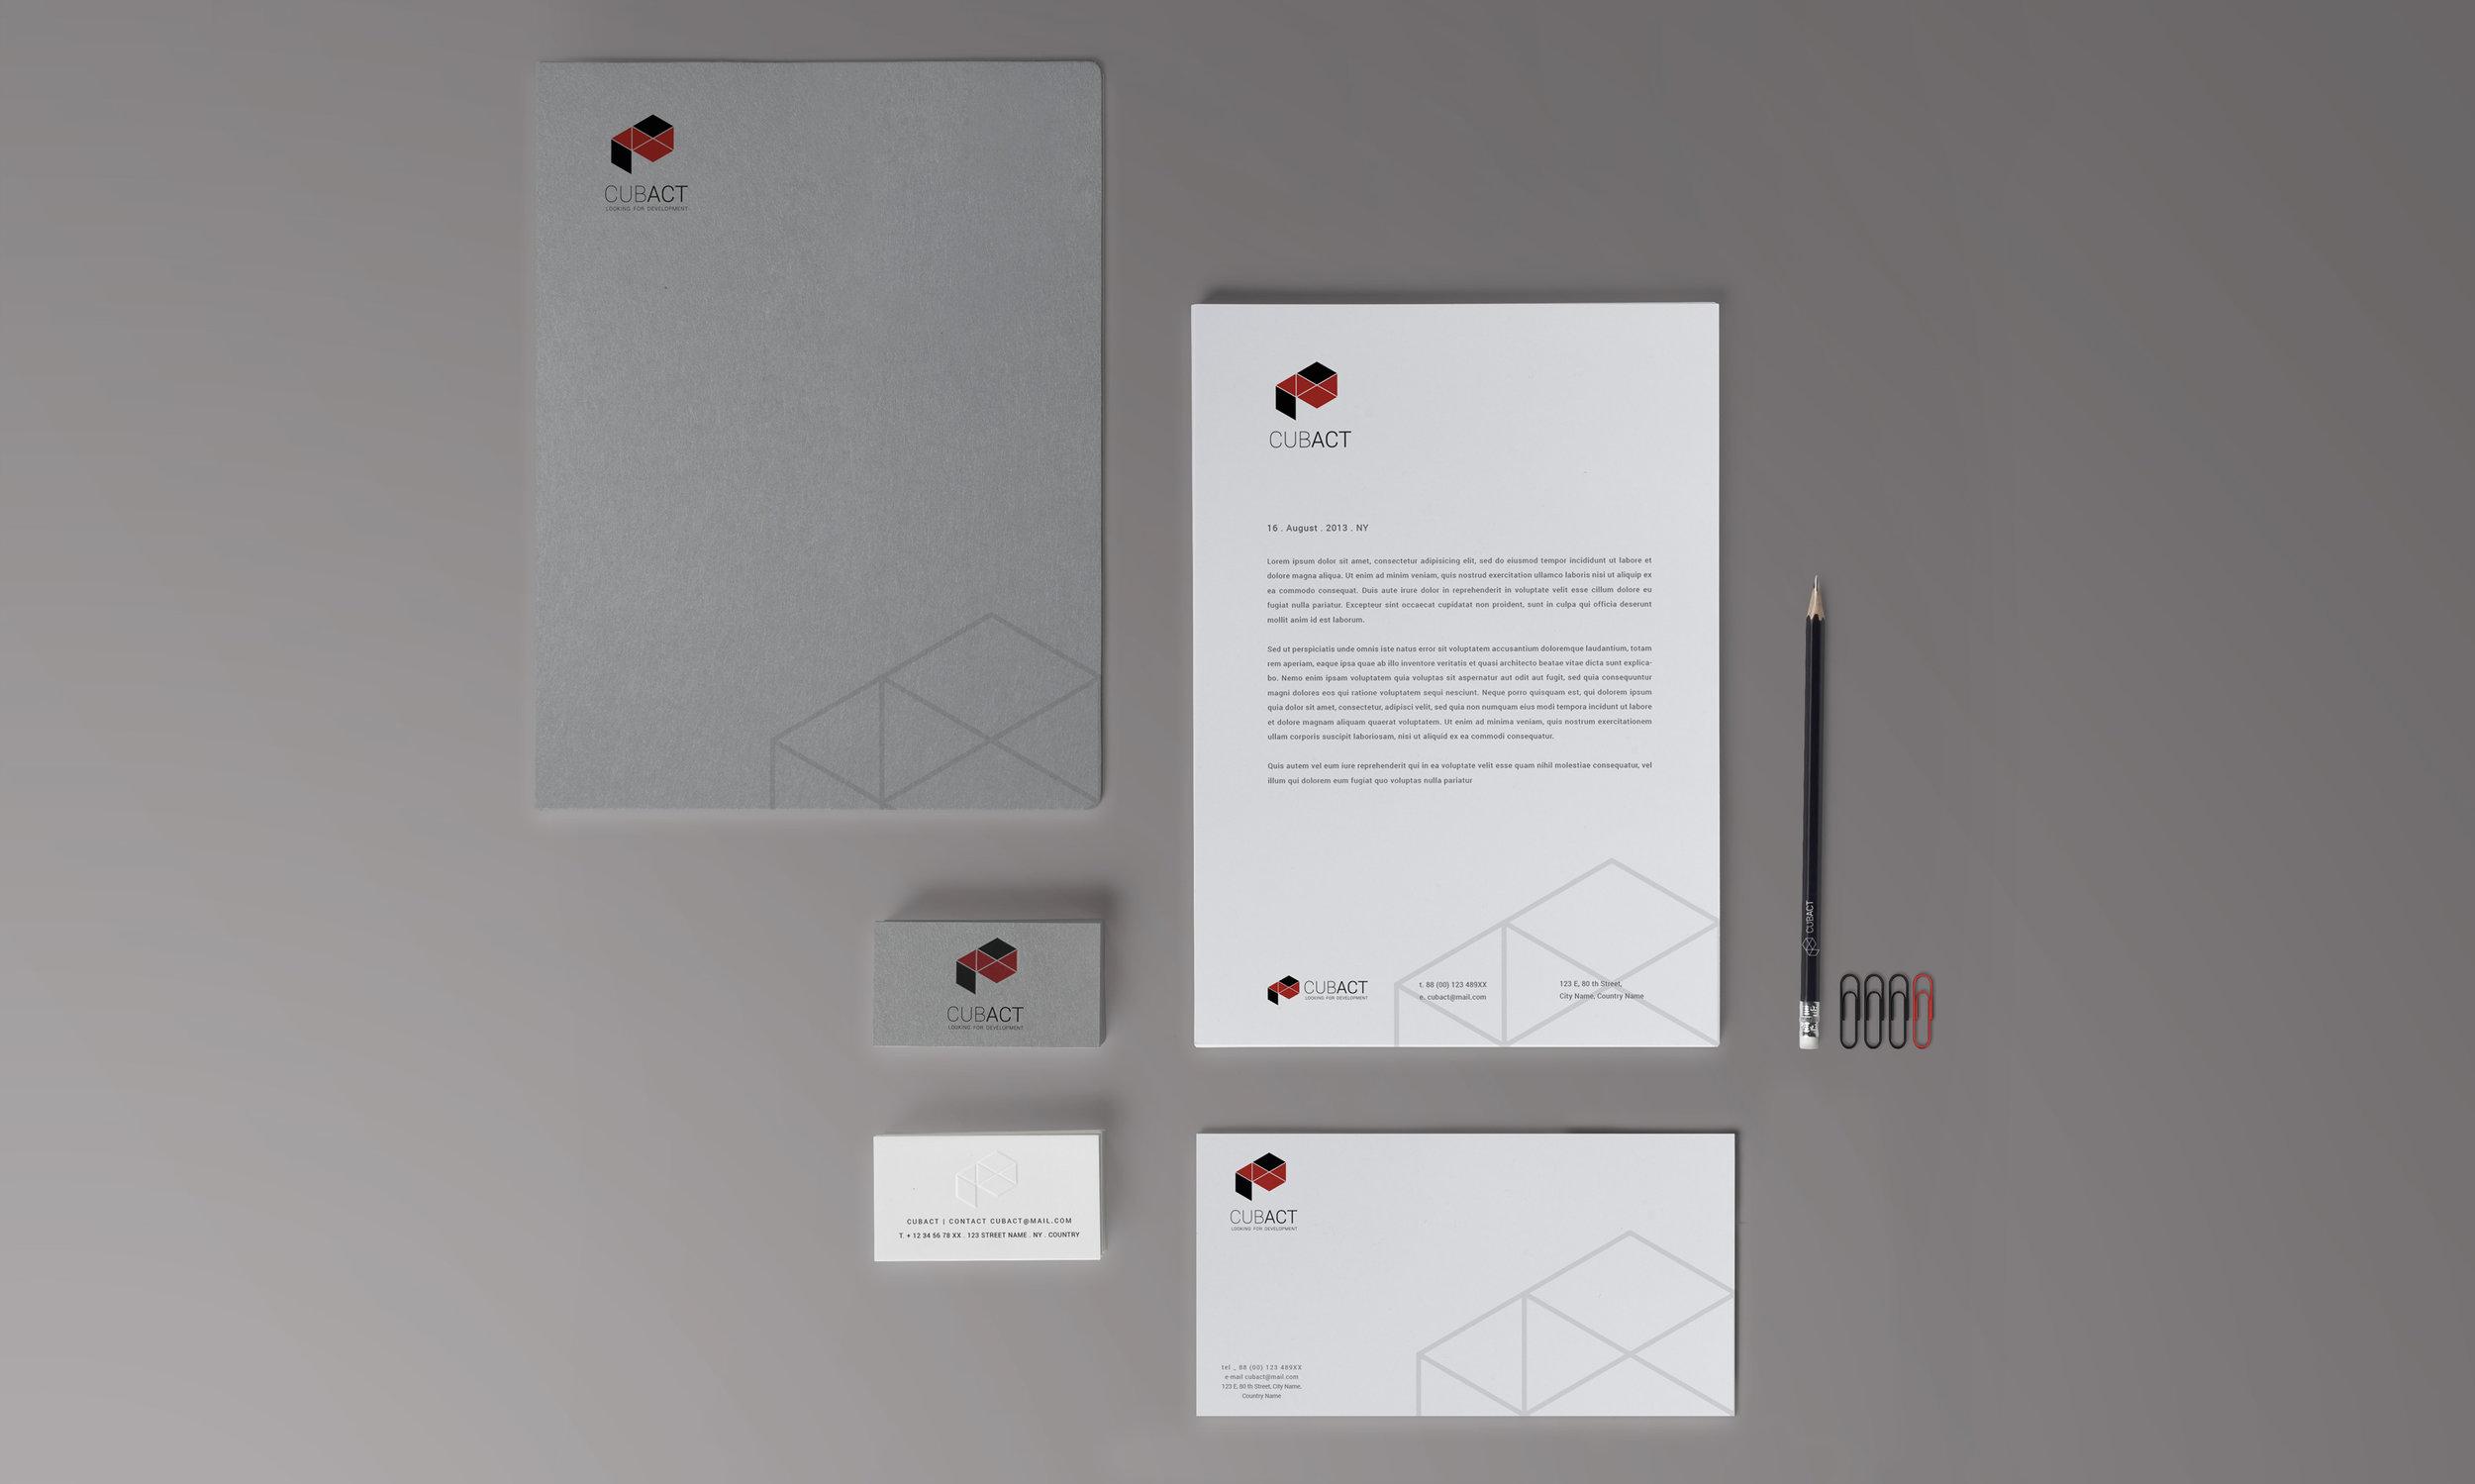 Cubact-Universita-Sassari-Branding-logo-immagine-coordinata.jpg